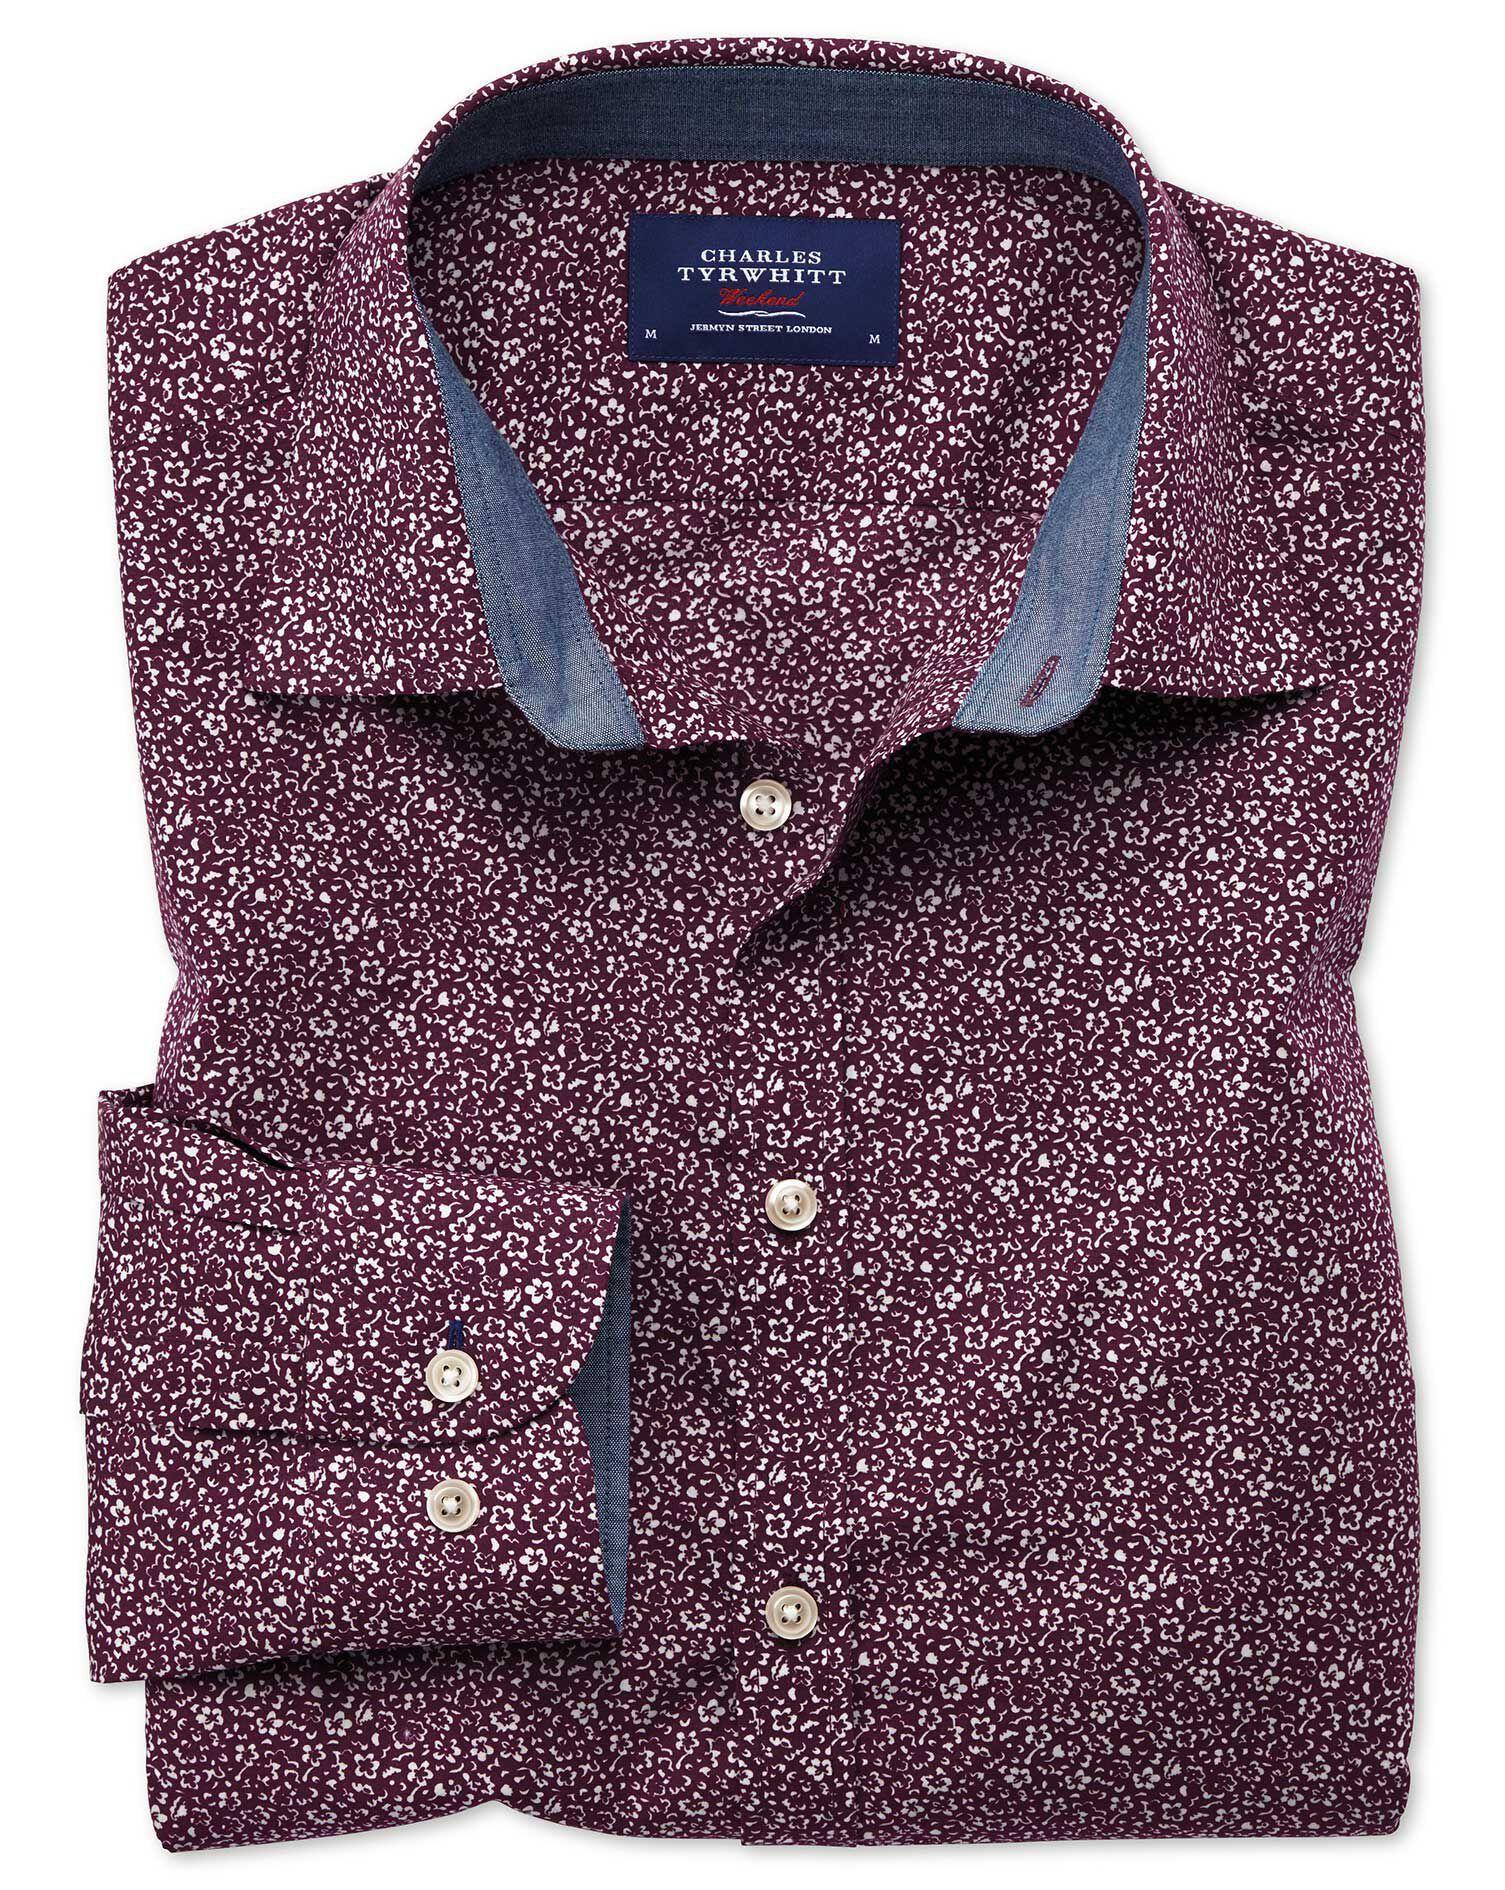 Classic Fit Purple Floral Print Cotton Shirt Single Cuff Size Medium by Charles Tyrwhitt